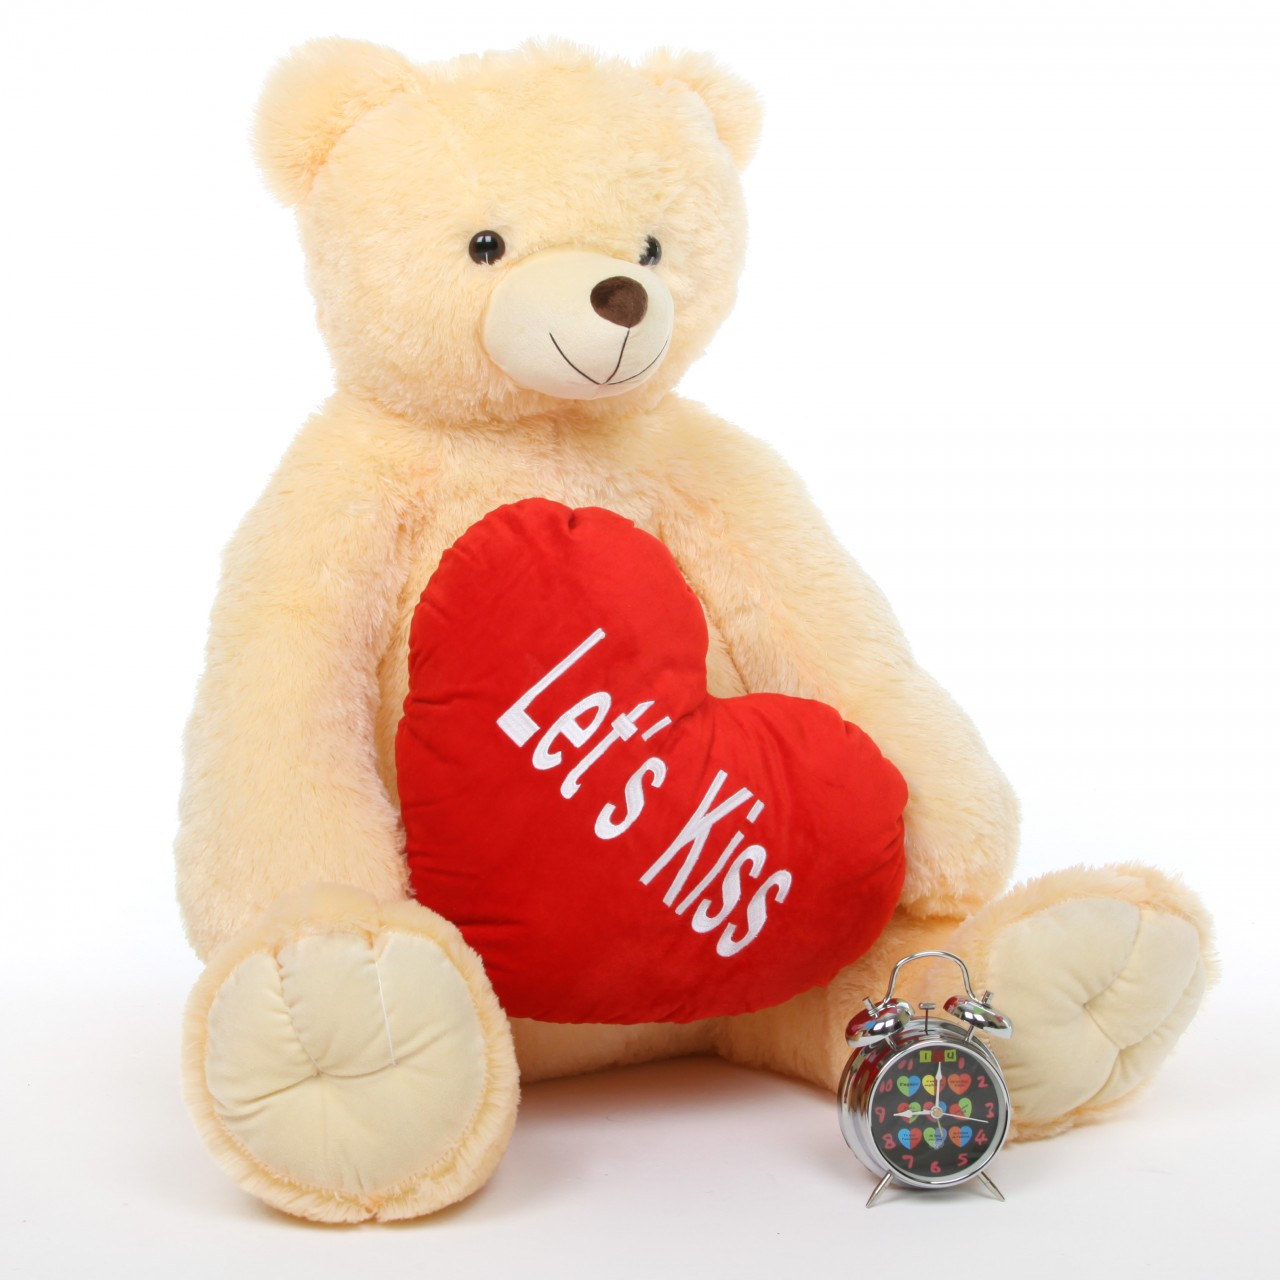 4ft Cream Teddy Bear Tiny Heart Tubs with Red Heart